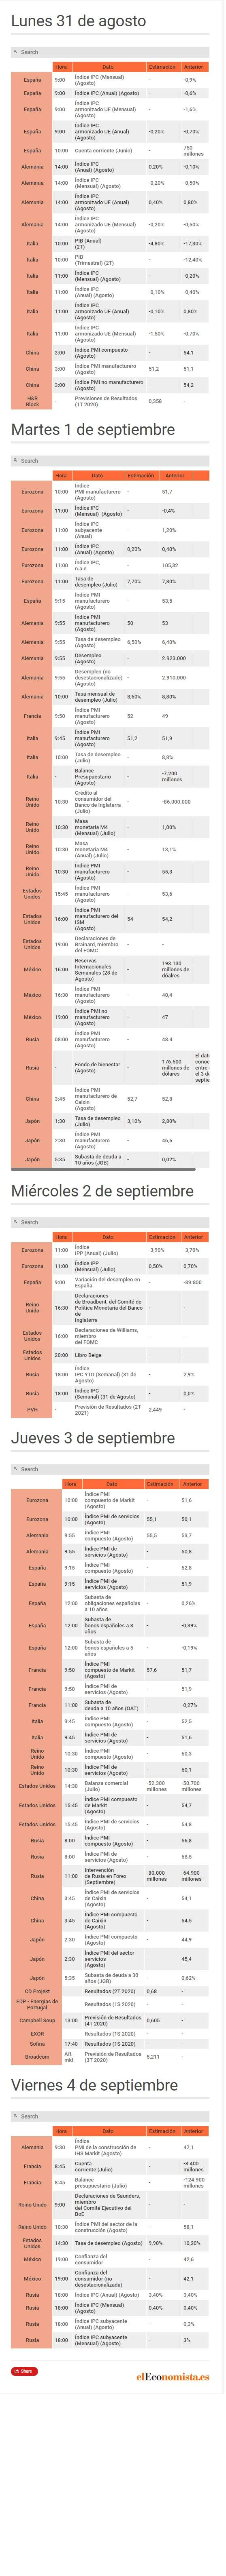 La agenda macroeconómica de la semana